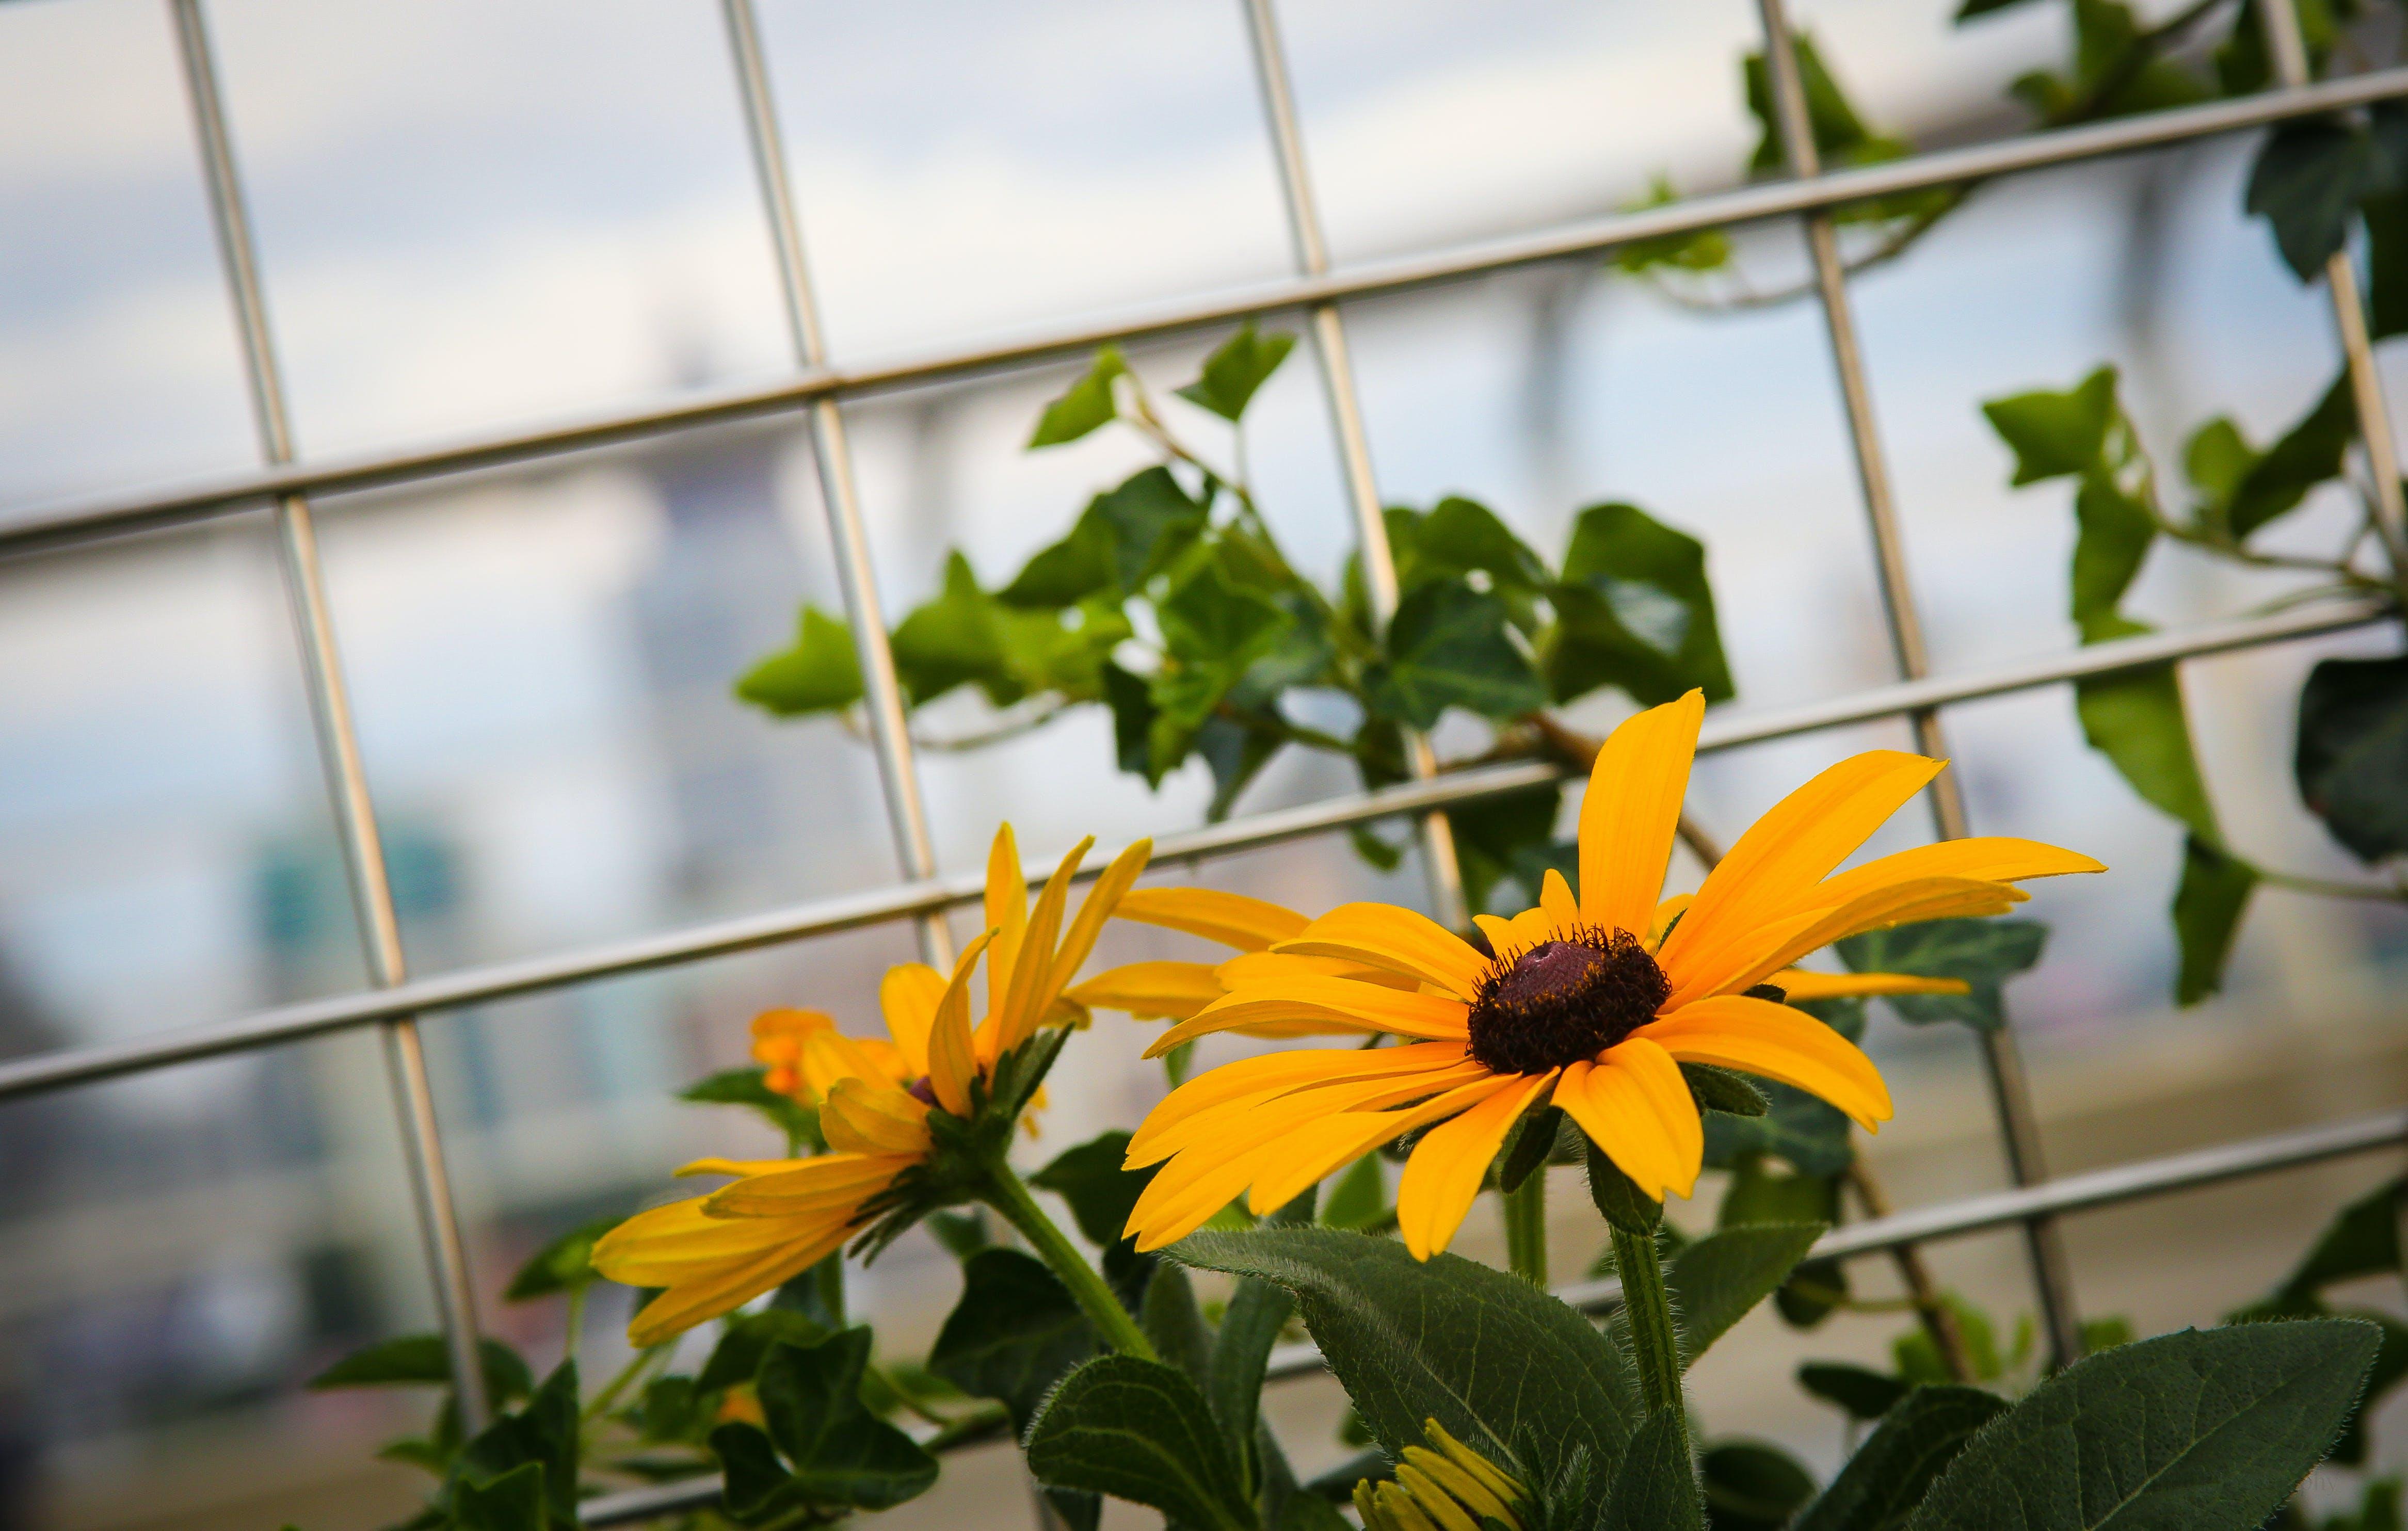 Free stock photo of Atl, atlanta, beautiful flowers, city